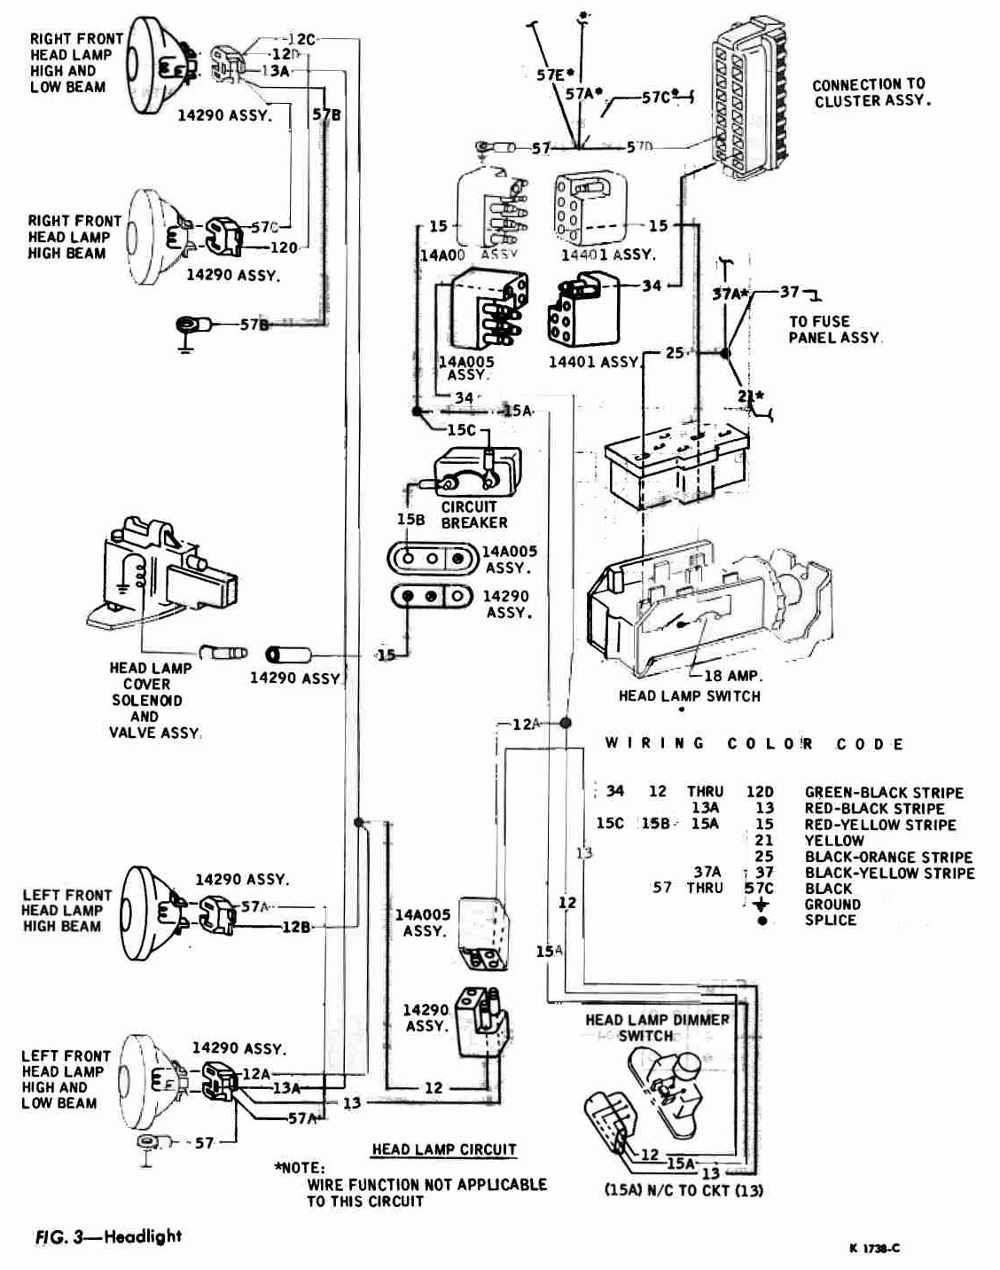 Headlight Schematic Diagram Of 1967 1968 Thunderbird Diagram Thunderbird Headlights